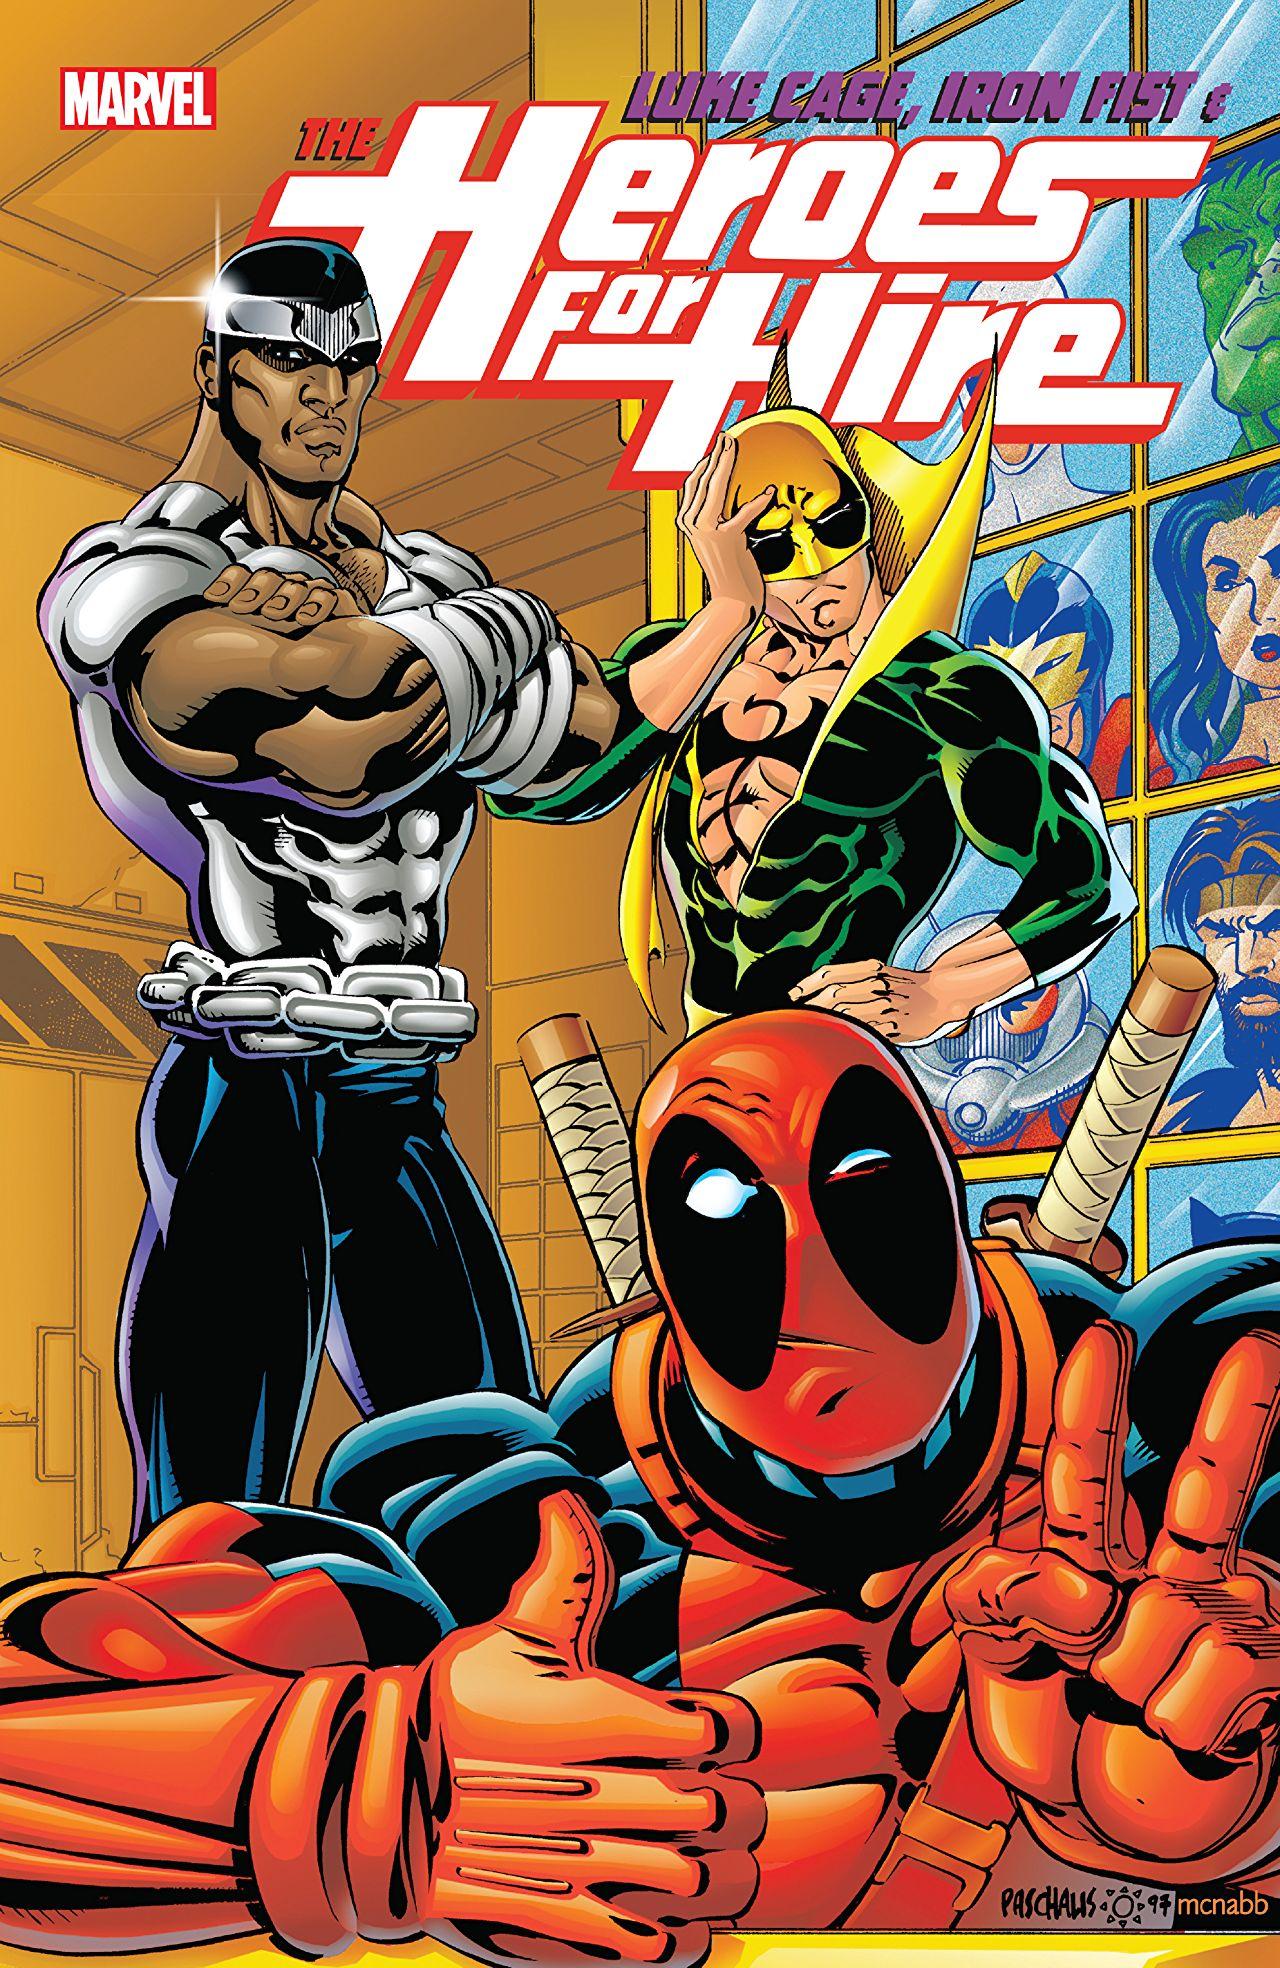 news marvel netflix luke cage iron fist heroes for hire eroi in vendita